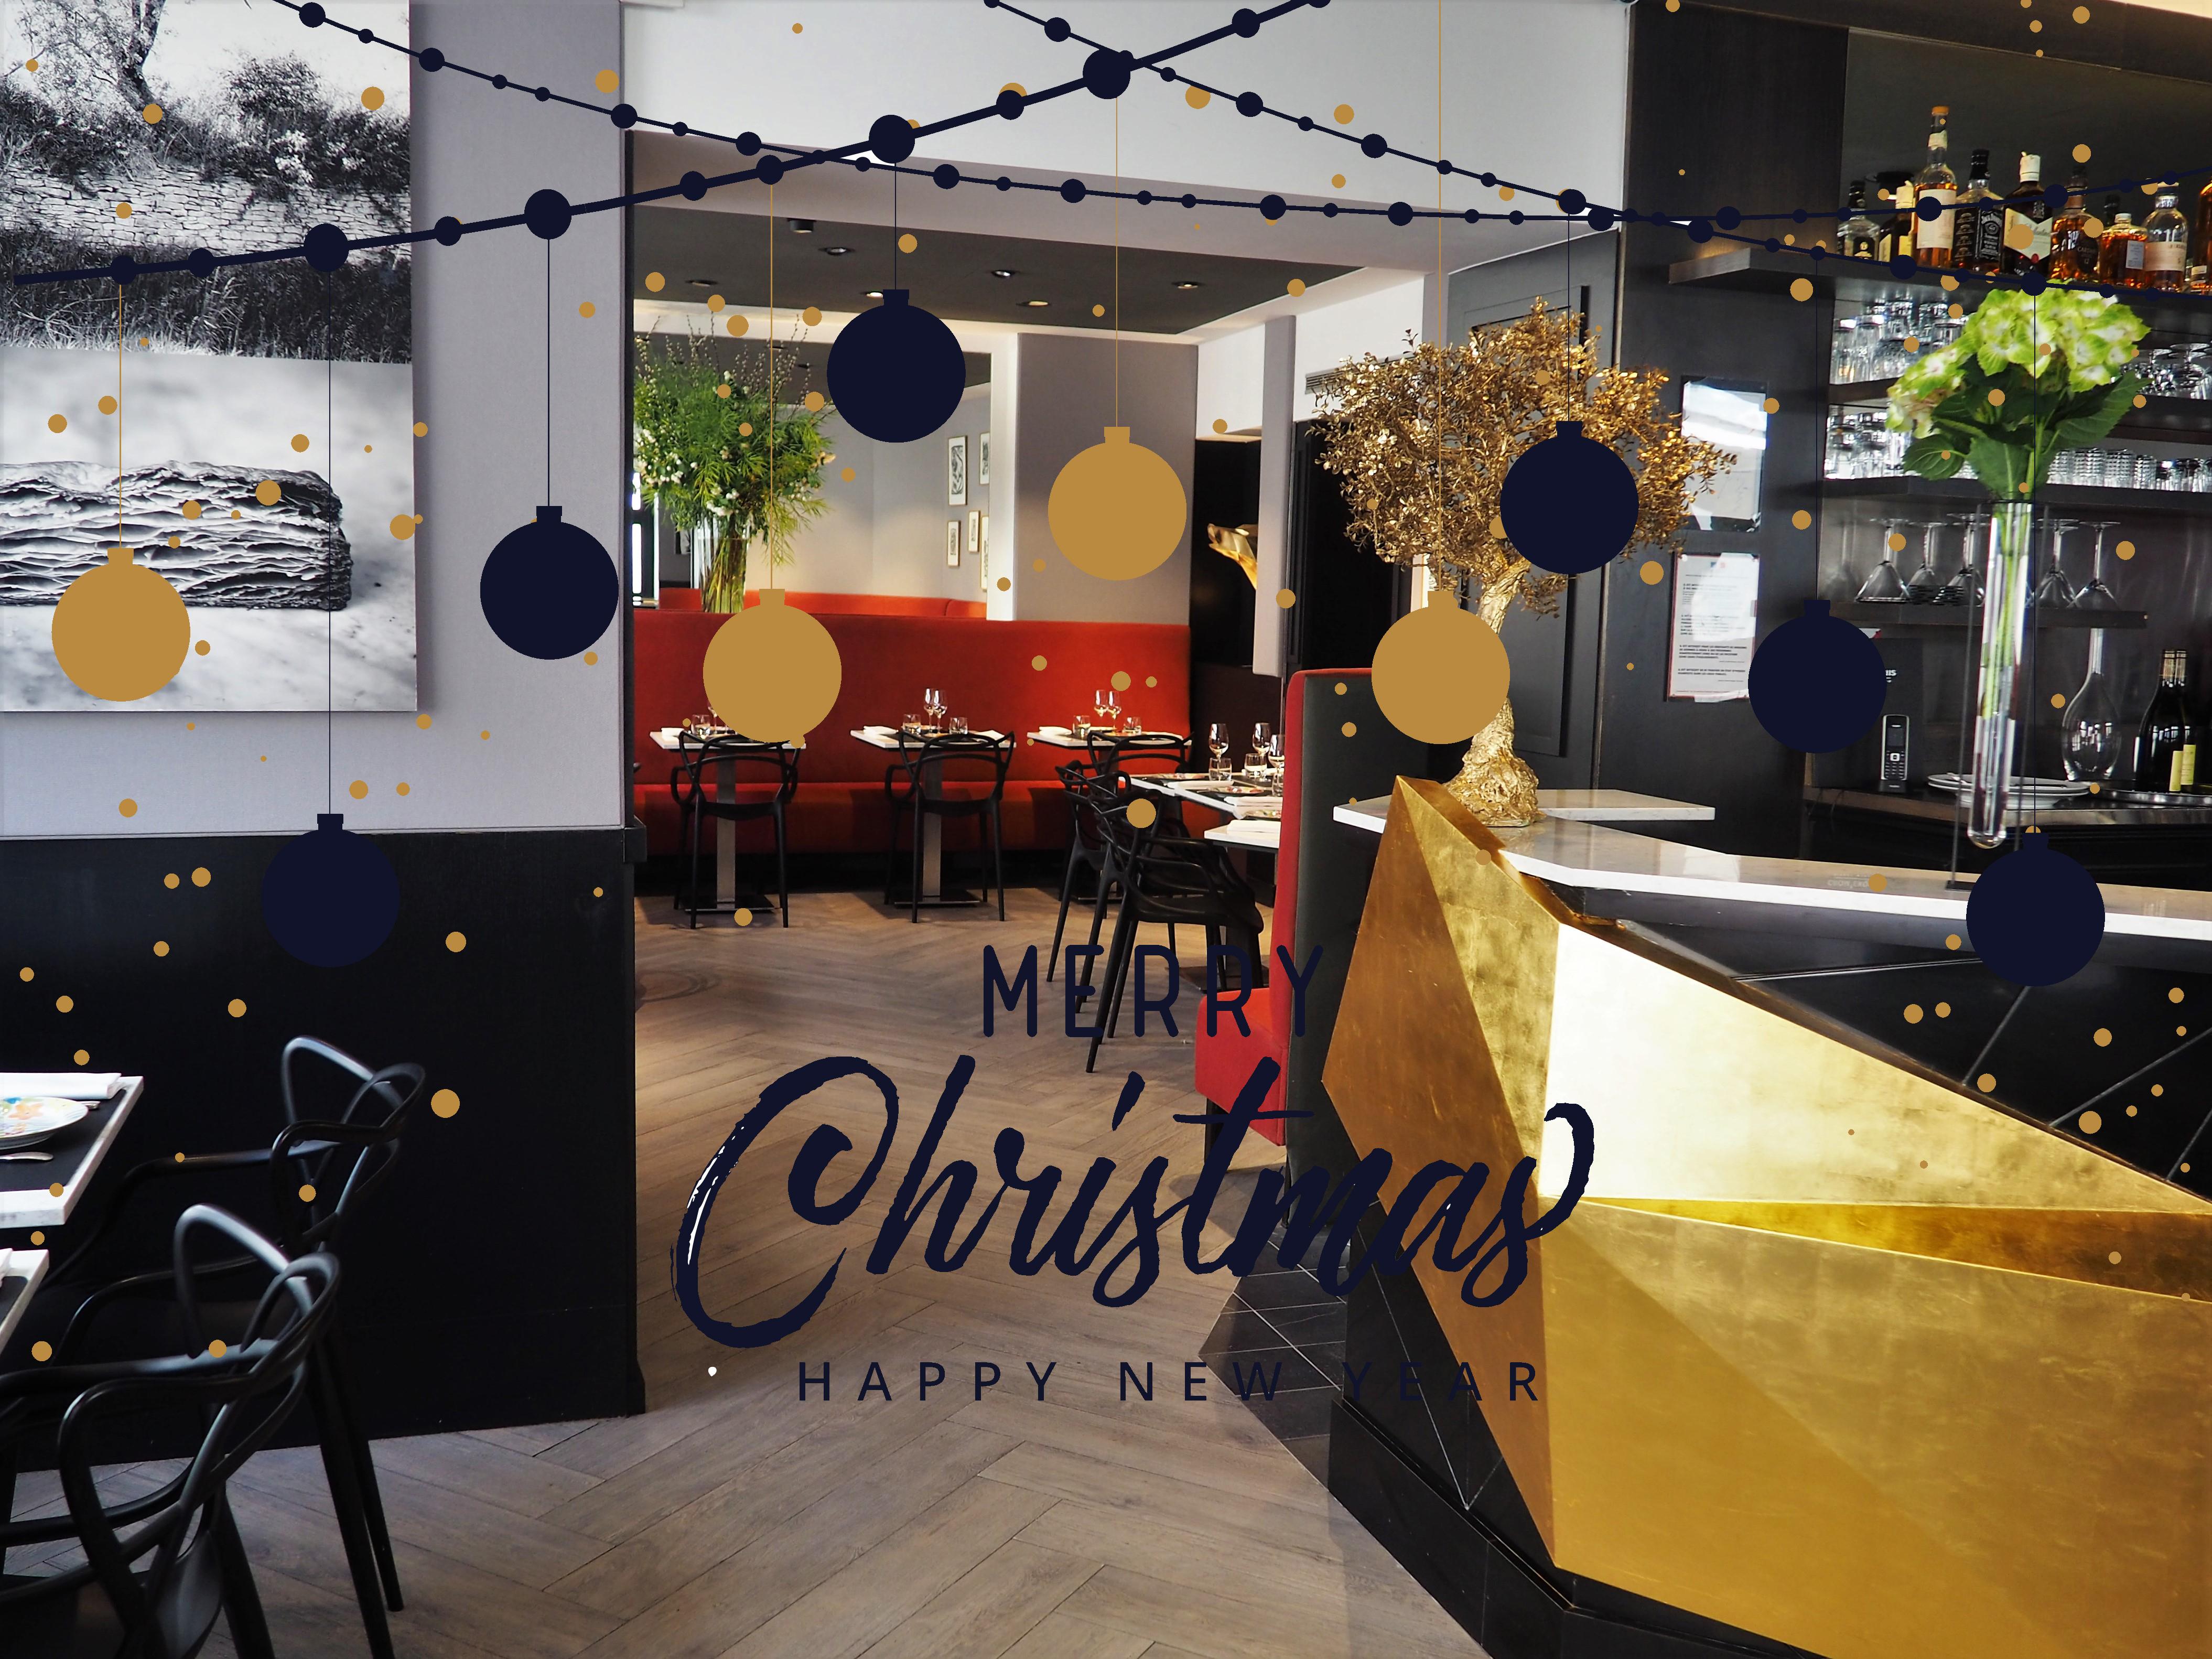 http://empreintemeneau.com/assets/uploads/2017/12/Salle-de-restaurant-Crom_Exquis-©AngiaVaudon-2.jpg